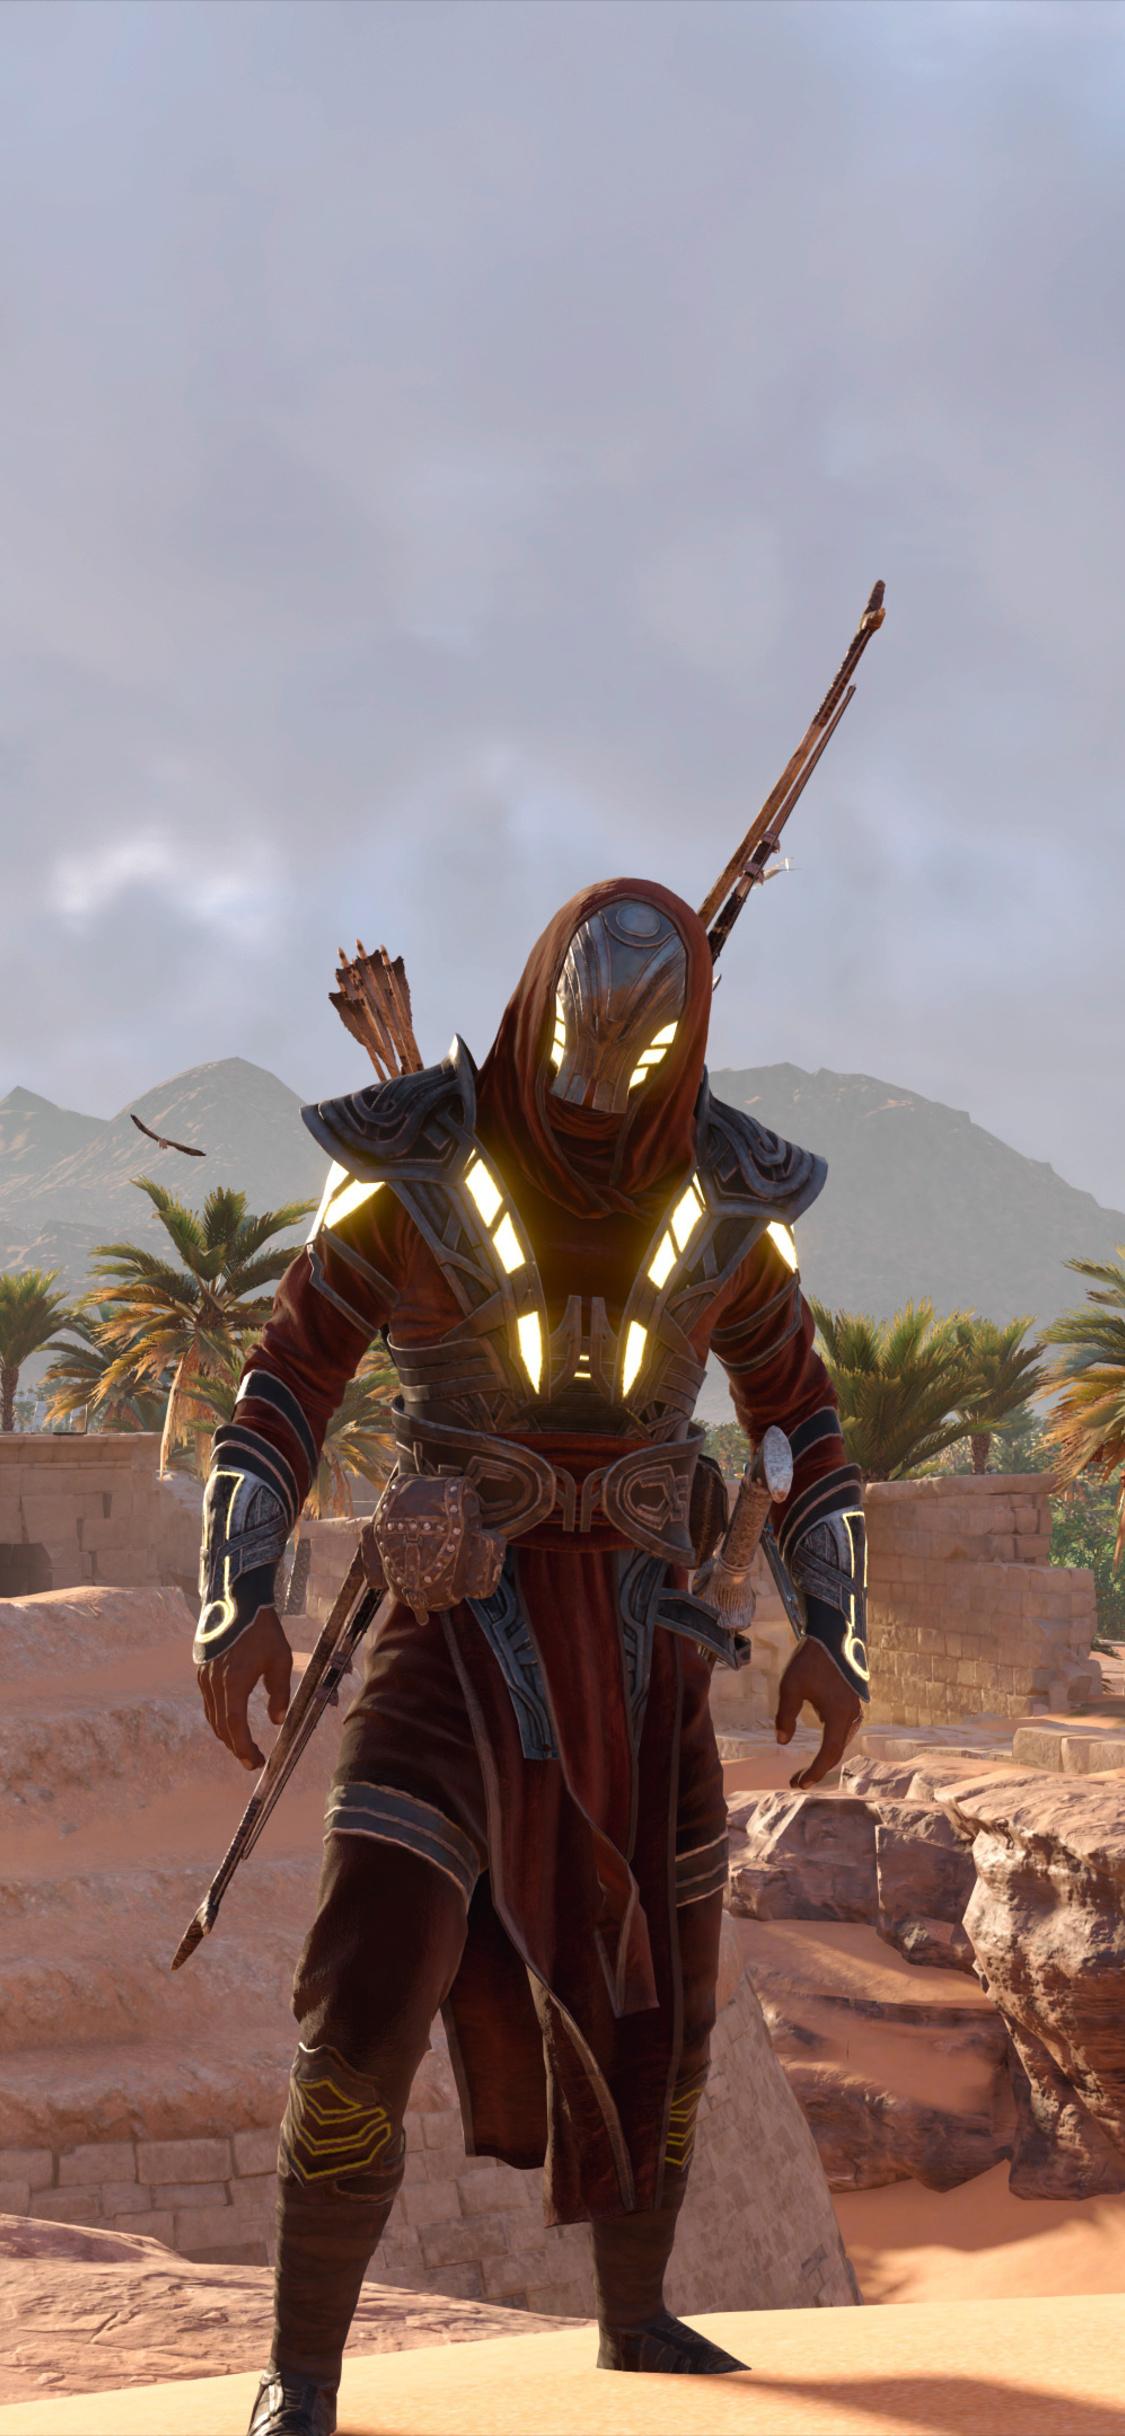 1125x2436 Assassins Creed Origins Video Game 4k Iphone Xs Iphone 10